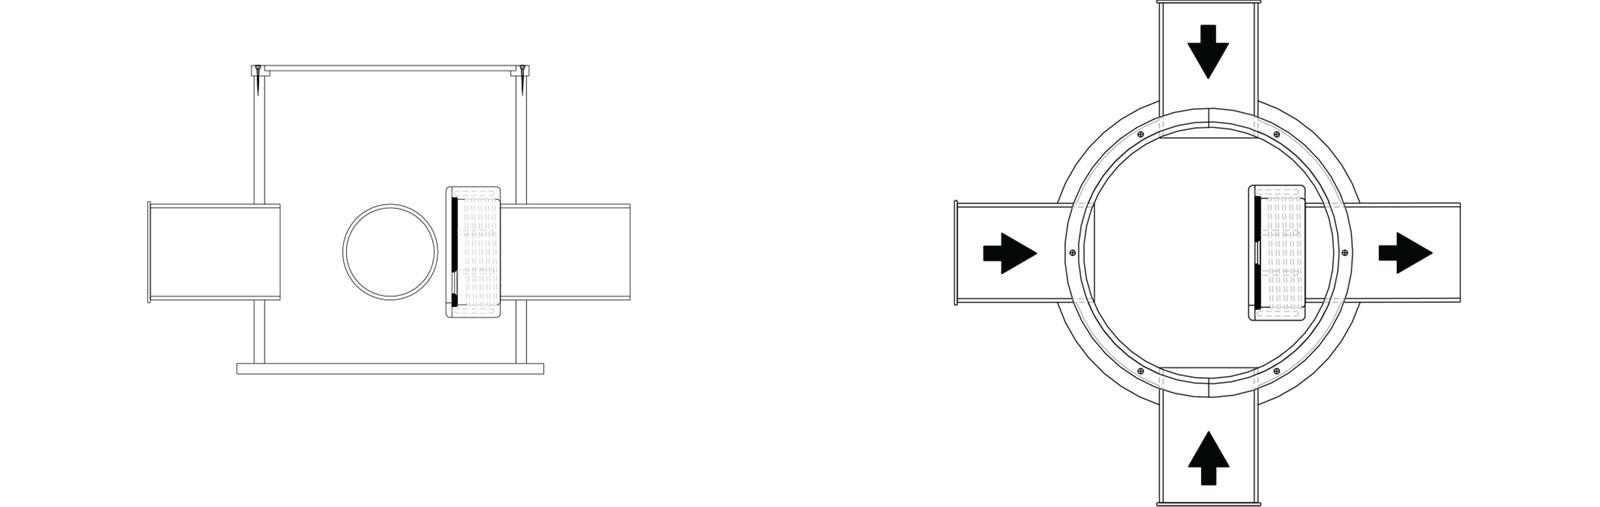 Controflow SUDS01001 dimensions